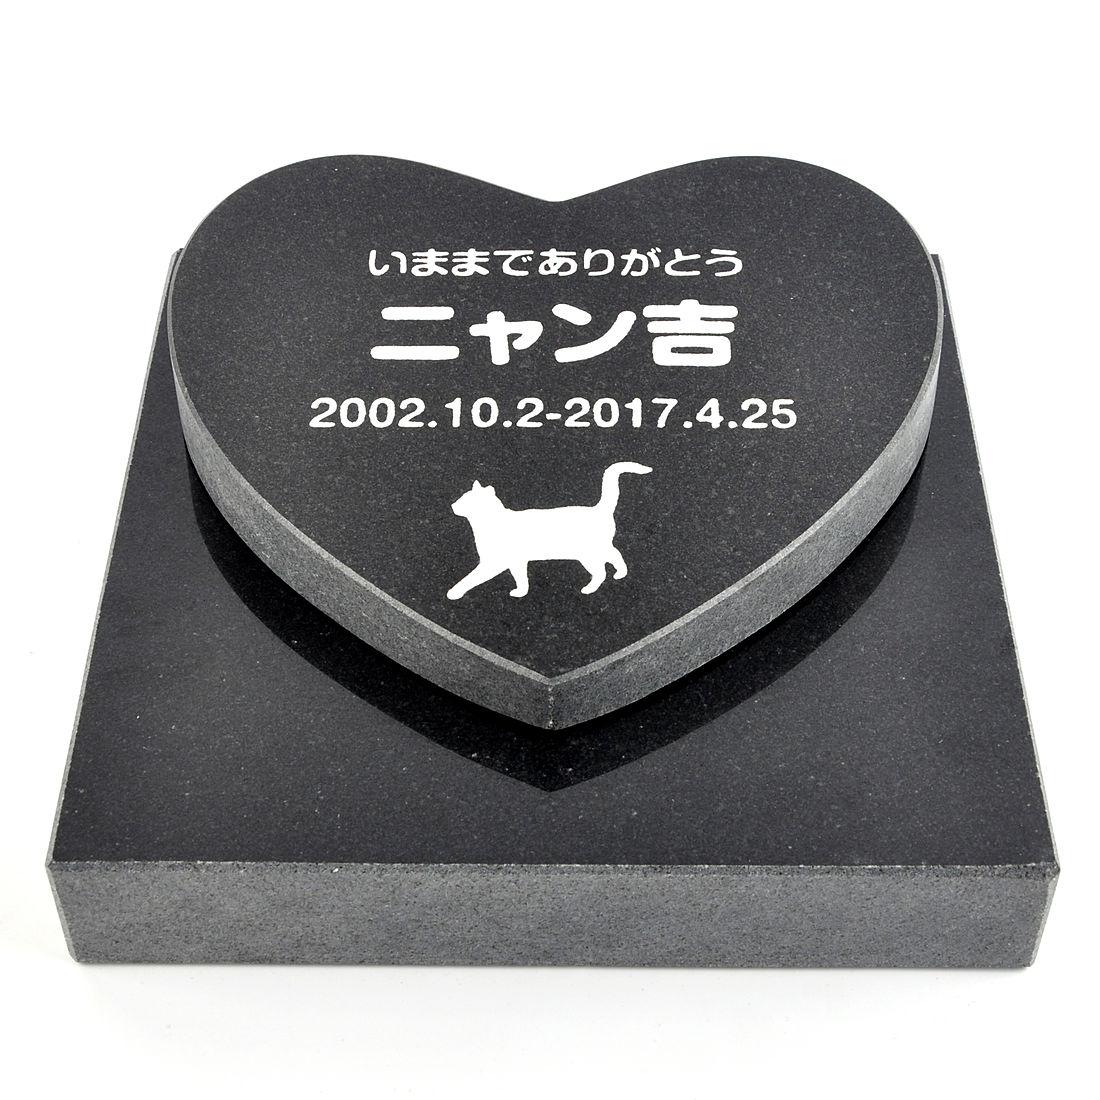 Pet&Love. ペットのお墓 天然石製 セット型 底板が厚く重いタイプ 御影石 ブラック ハート  【HLS_DU】【楽ギフ_名入れ】 attr177attr ctgr2ctgr sml3sml+ctgr2ctgr CAT